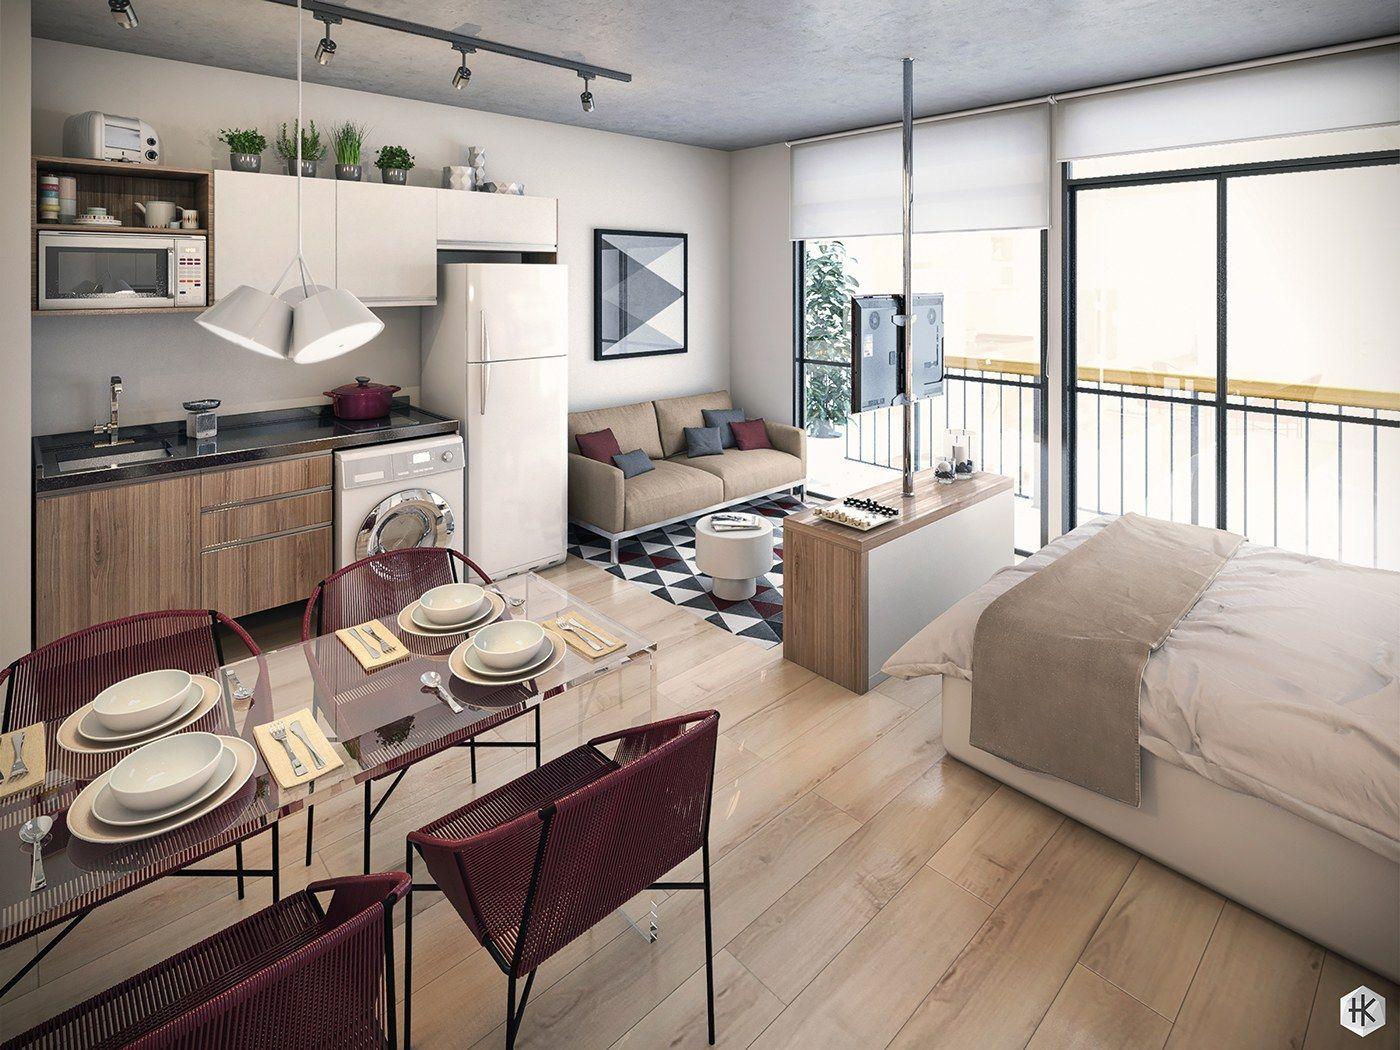 Amazing Photo Of Efficiency Apartment Ideas Efficiency Apartment Ideas 5 Small Studio A Small Apartment Interior Apartment Interior Apartment Interior Design